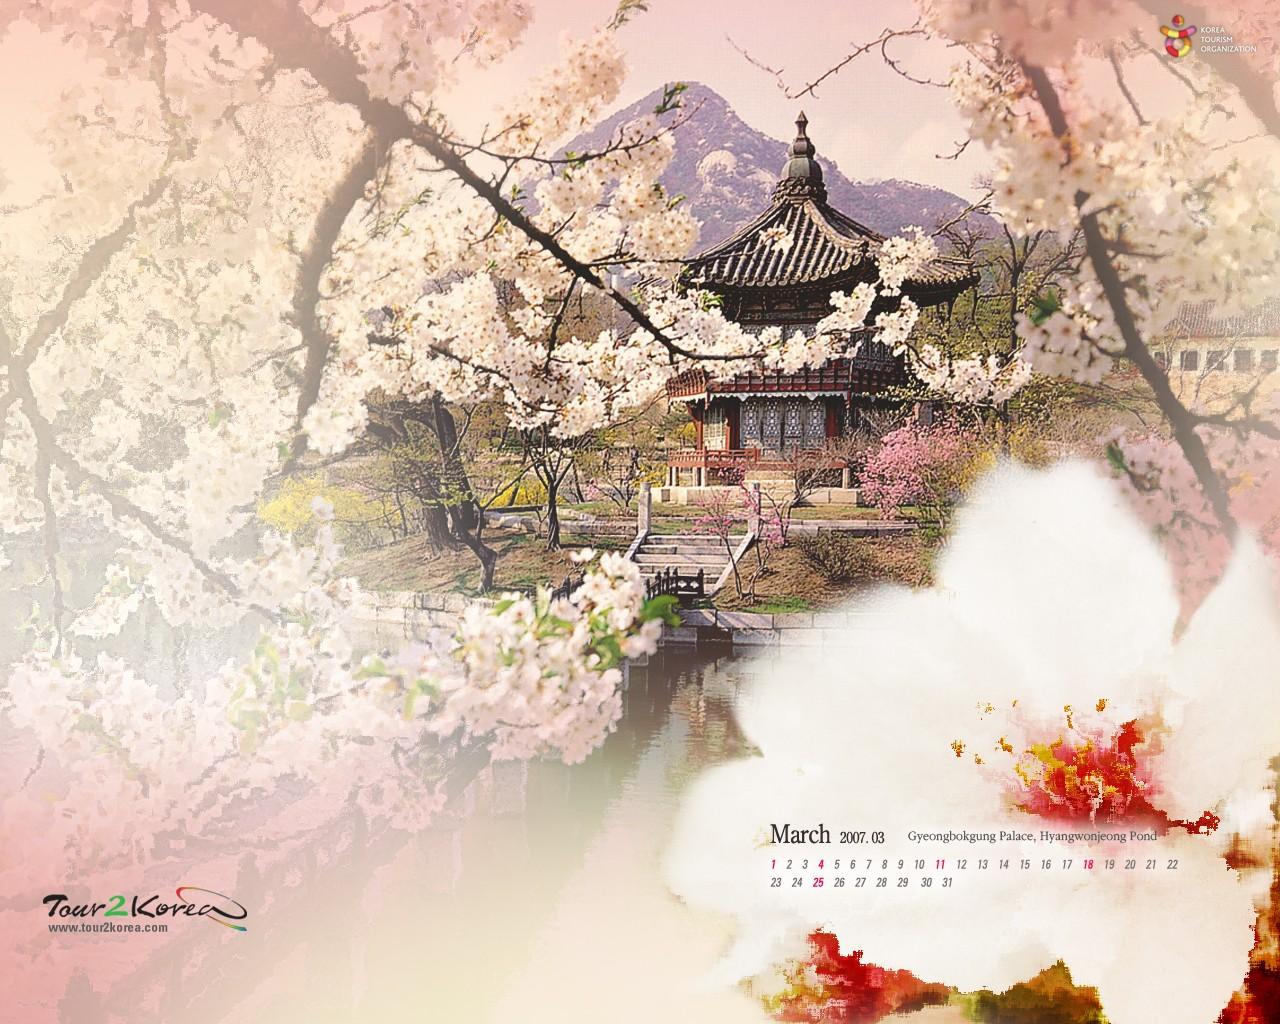 Wallpaper iphone korea - South Korea South Korea Tourist Attractions 1280 1024 No 6